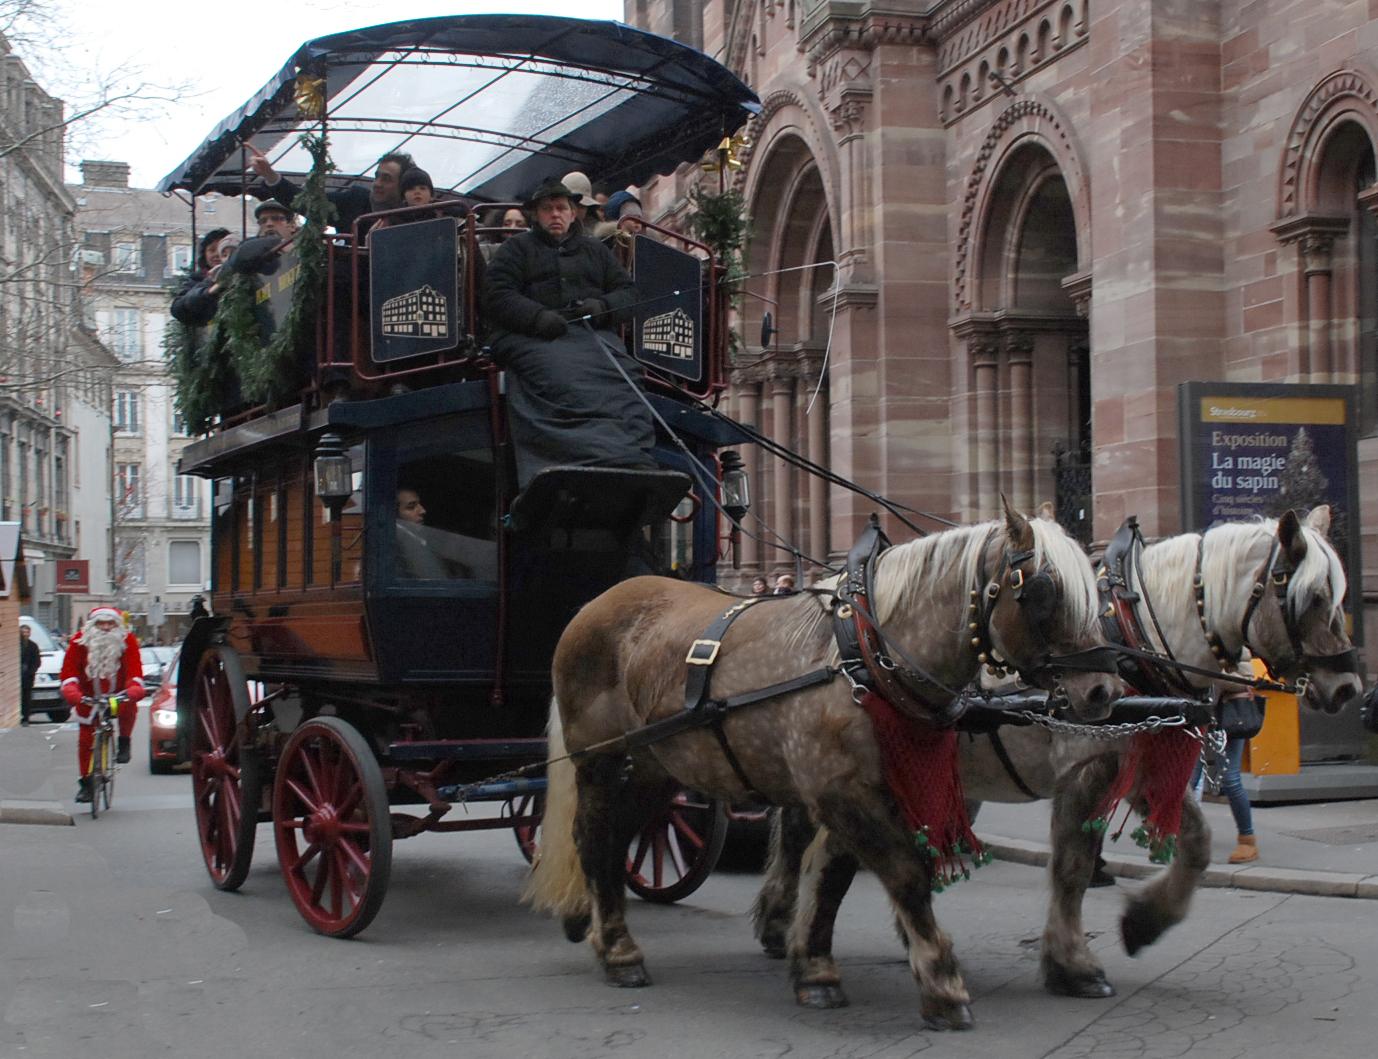 Drawn carriage Horse carriage carriage drawn Skelly